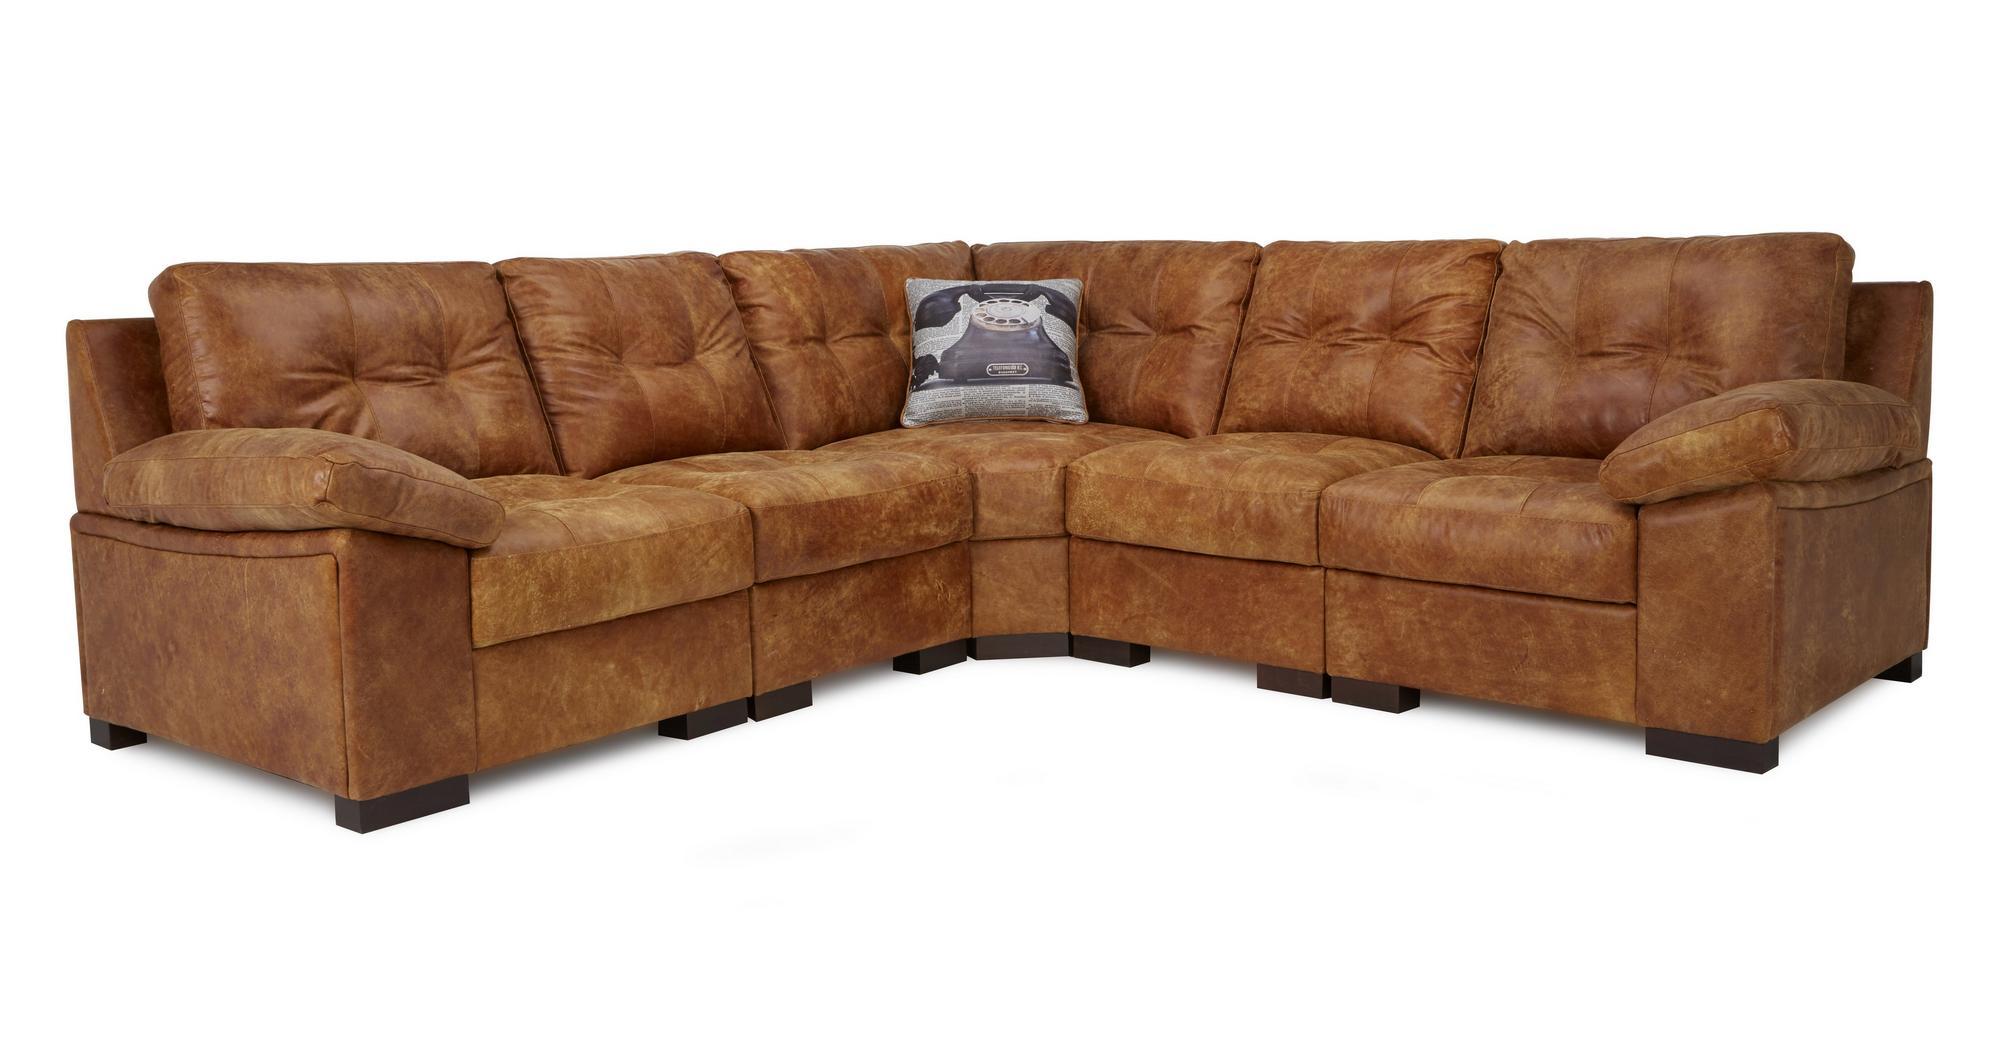 Dfs Rafael Ranch Brown Natural Leather Modular Corner Sofa